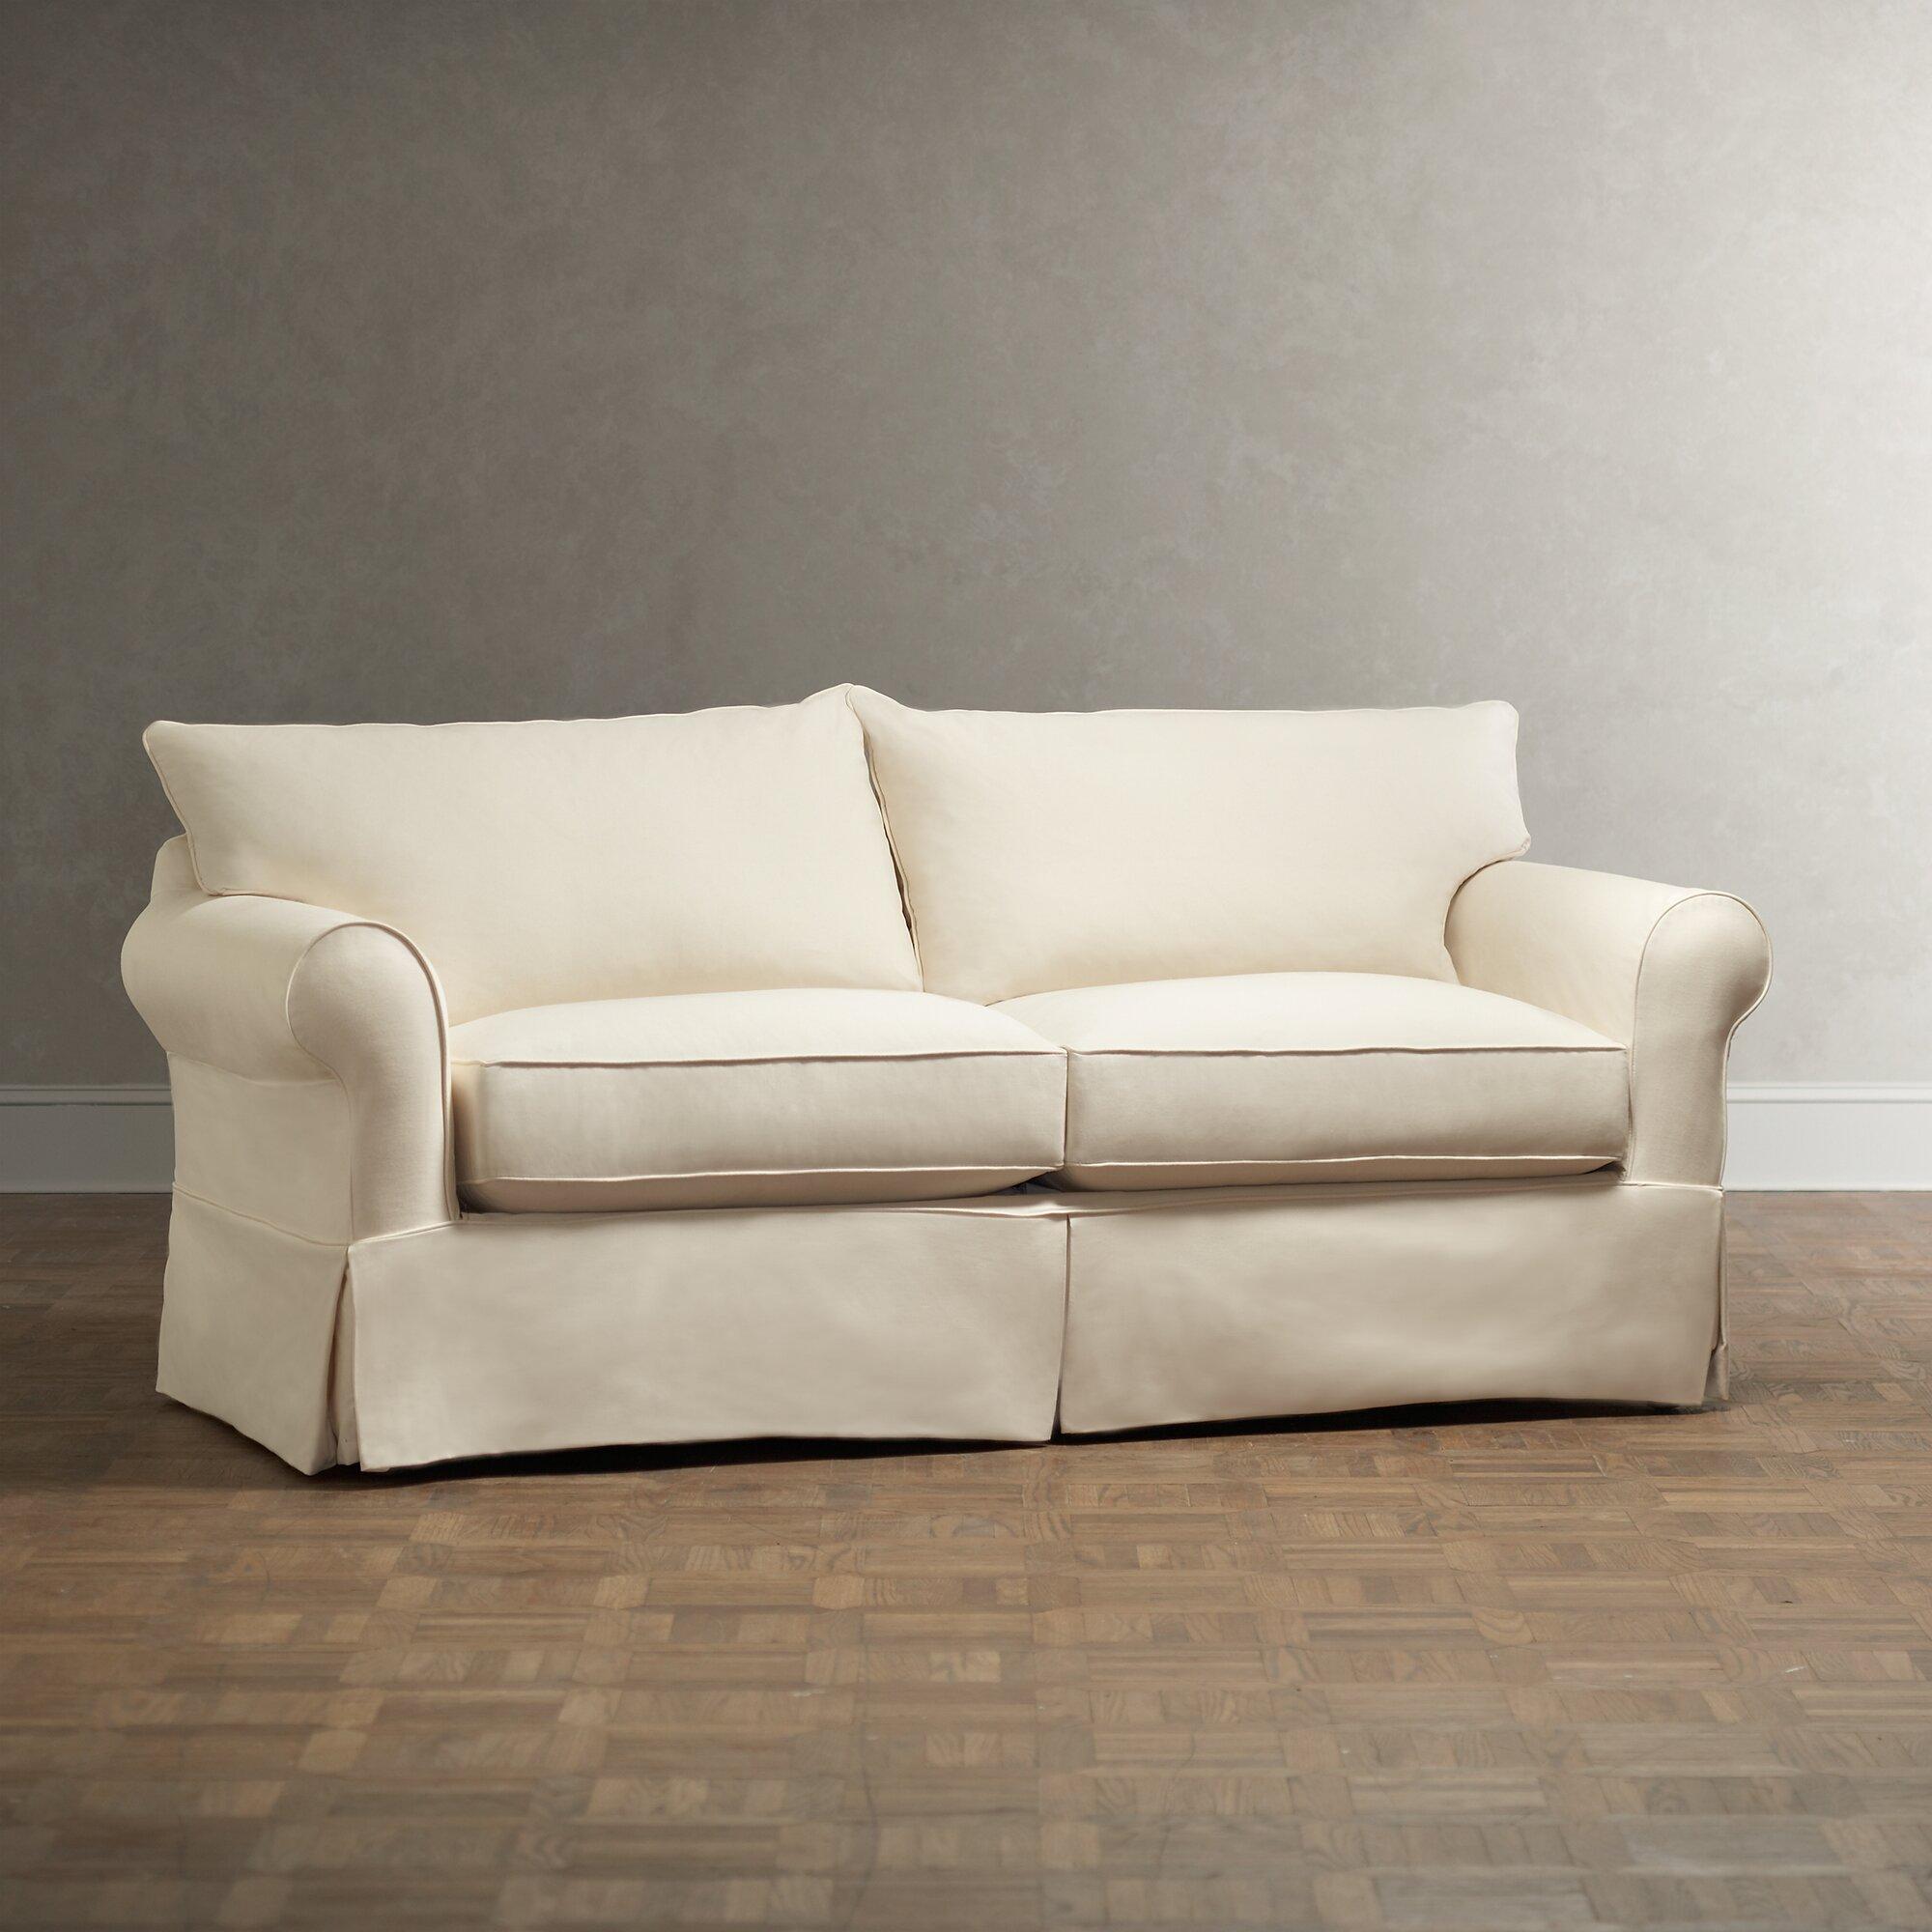 Fine 20 Best Birch Lane Sofa Best Collections Ever Home Decor Inzonedesignstudio Interior Chair Design Inzonedesignstudiocom